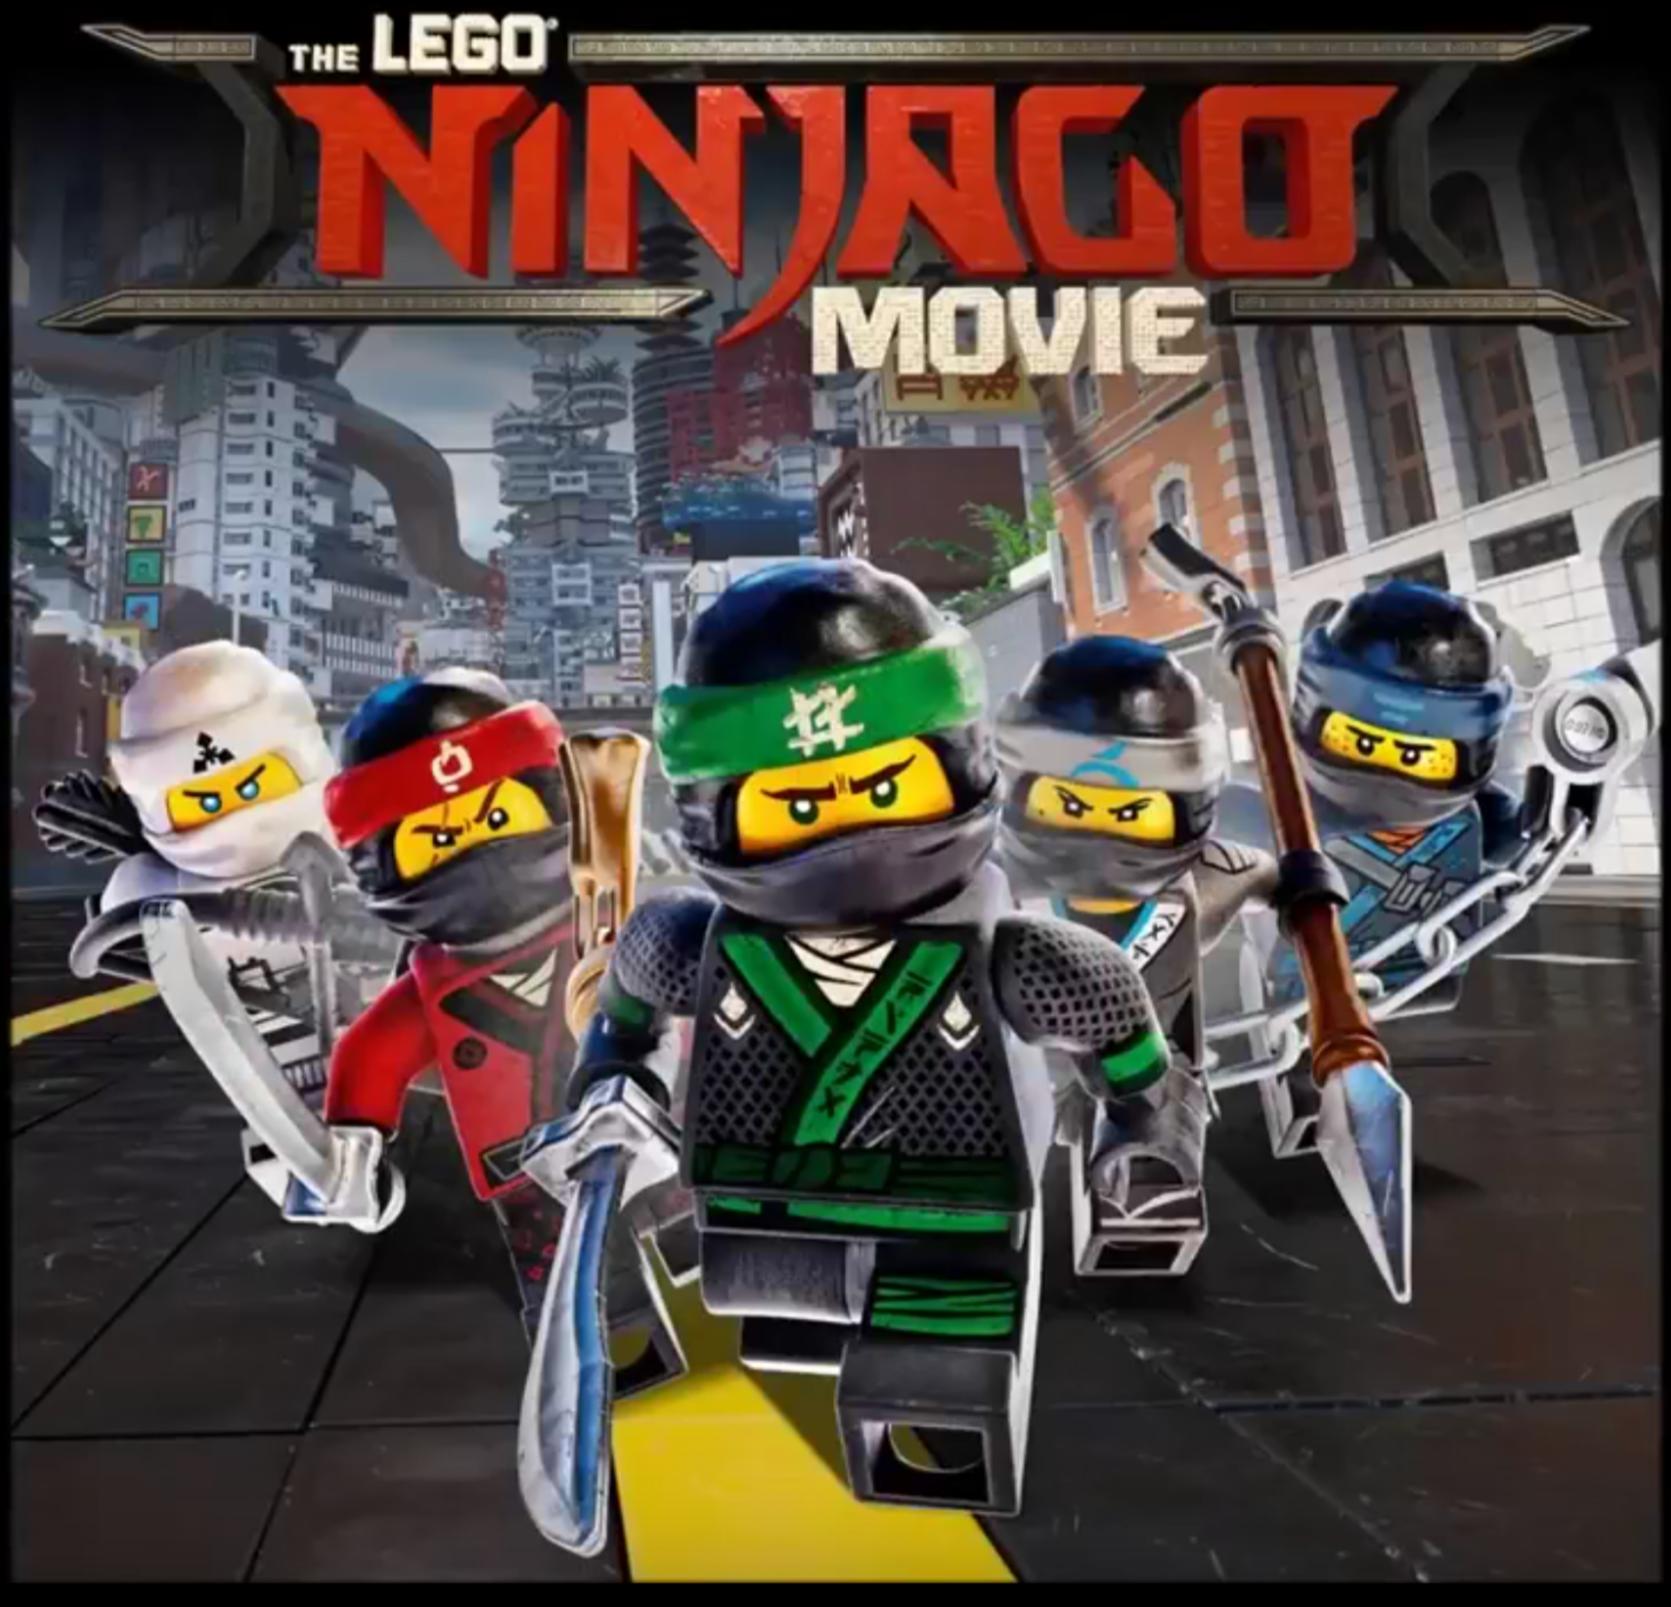 New lego ninjago movie posters lego ninjago news - Photo ninjago ...